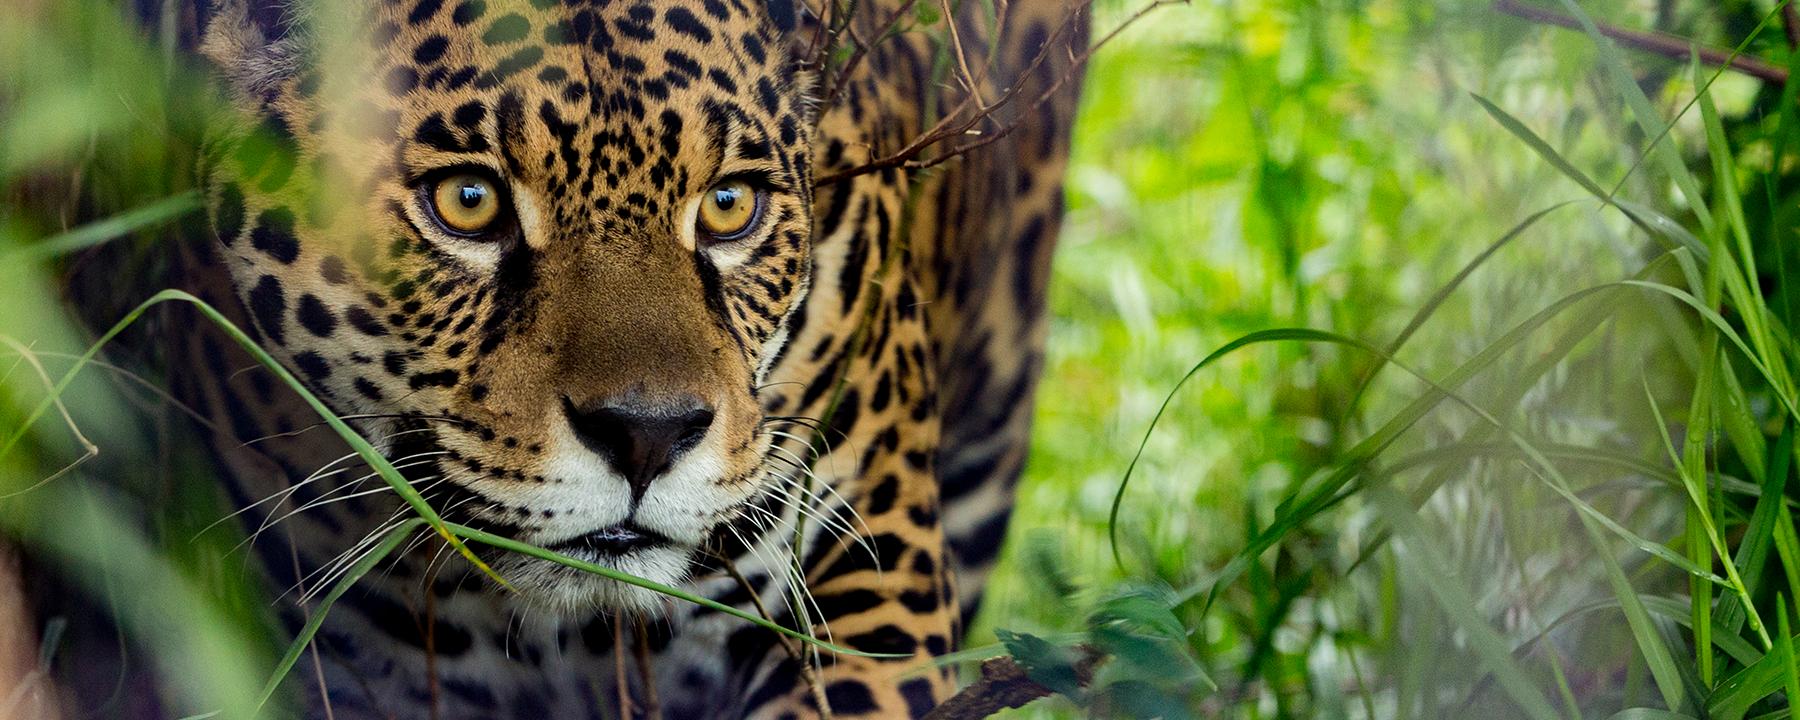 Slideshow: How Ecologists Study the World's Apex Predators